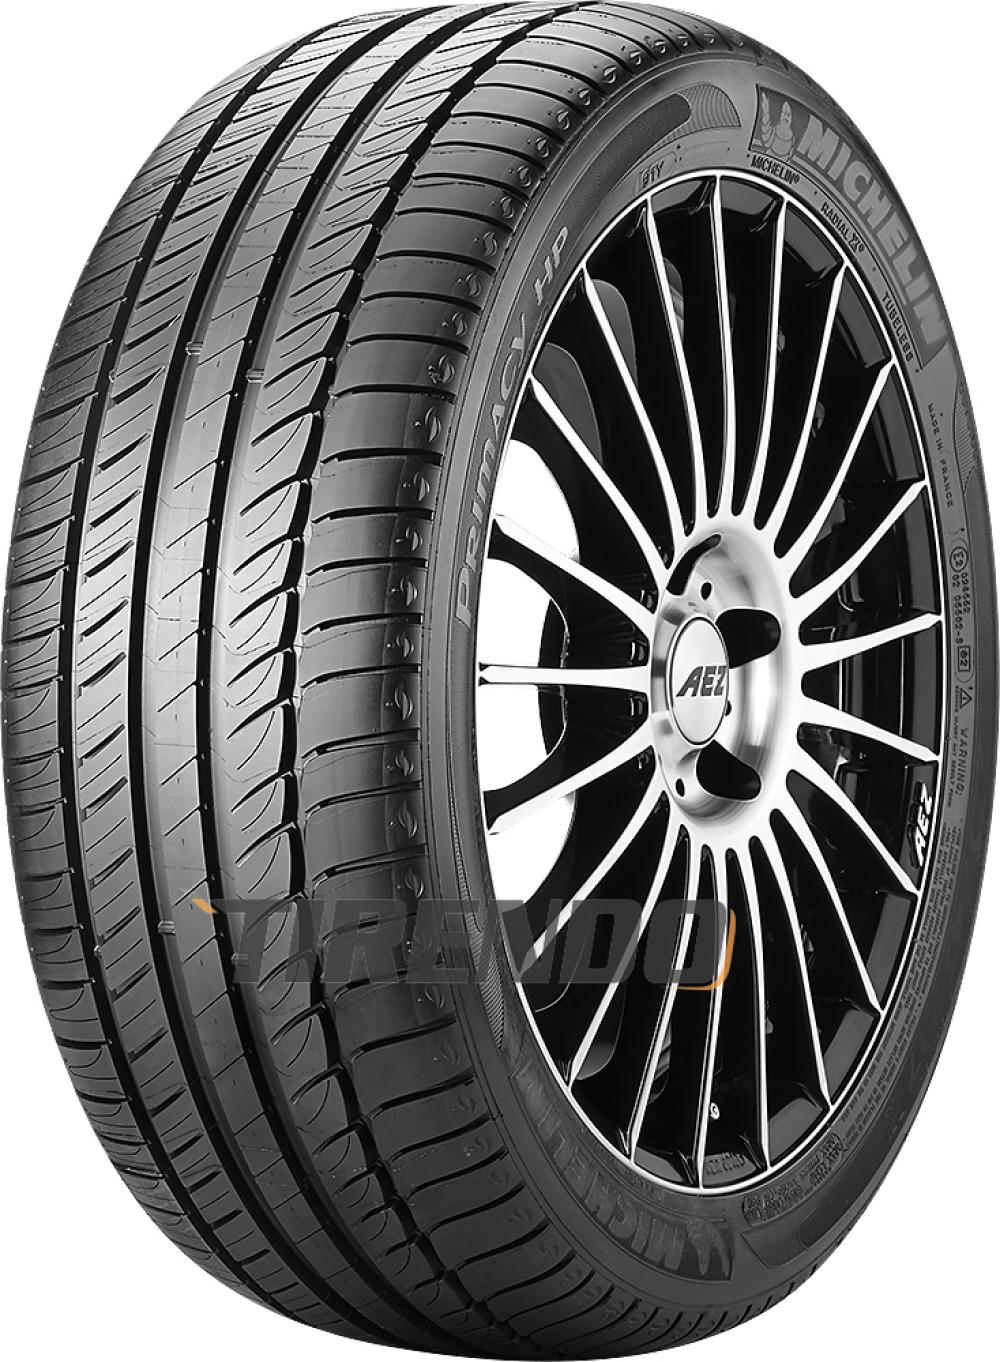 Michelin Primacy HP ( 205/55 R16 91W MO, GRNX, mit Felgenschutzleiste (FSL) )